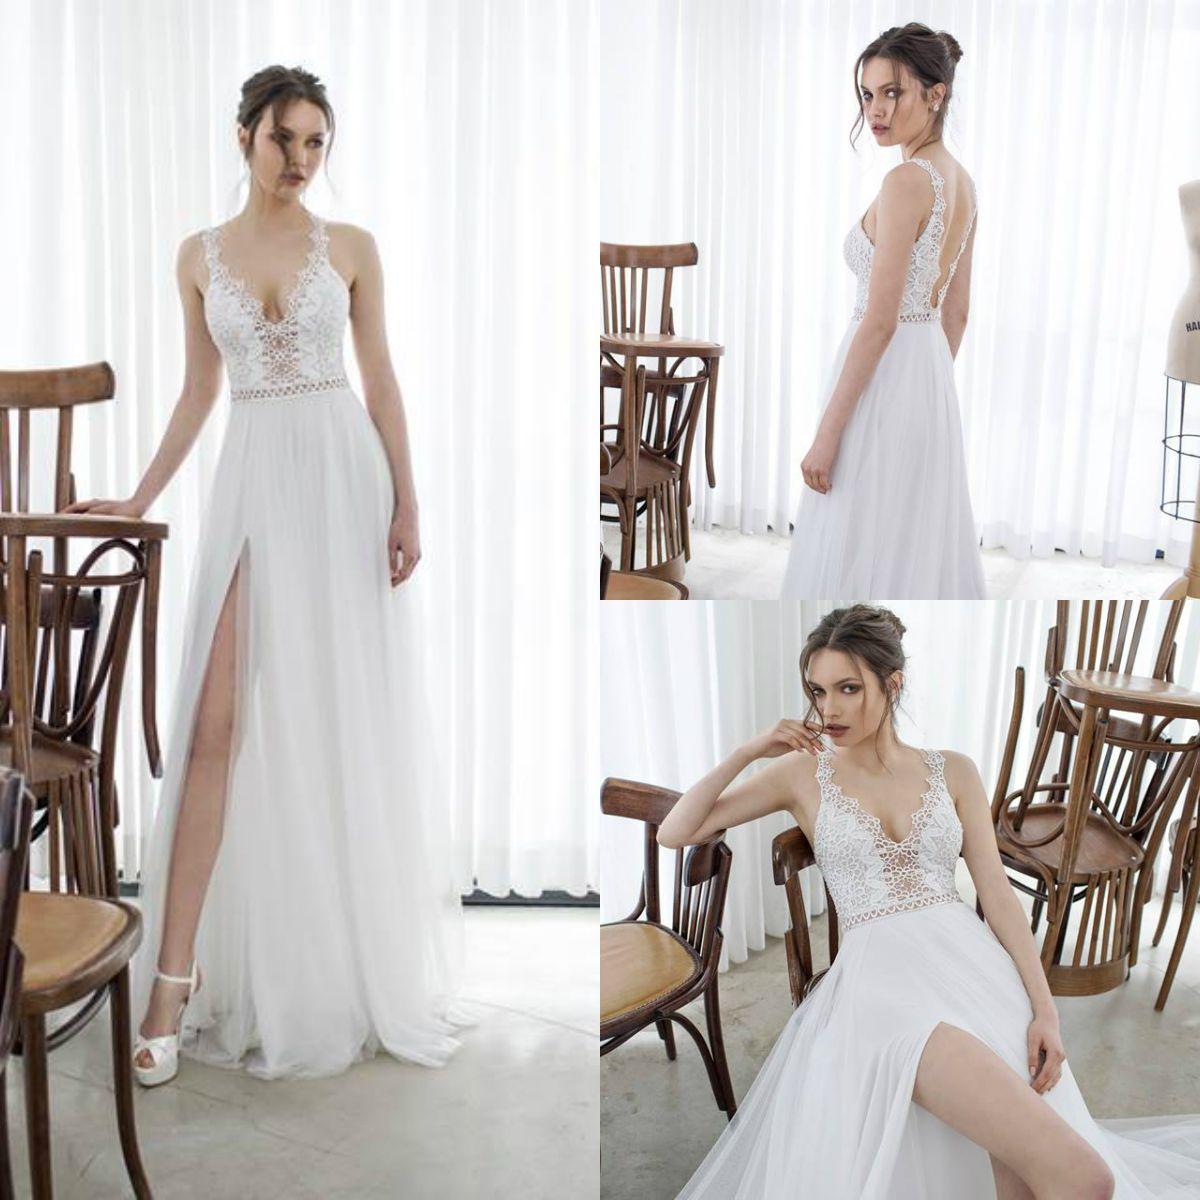 Cheap Stones For Dresses Decorations Discount Loose Linen Dress Wholesale: Linen Line Wedding Dress At Websimilar.org